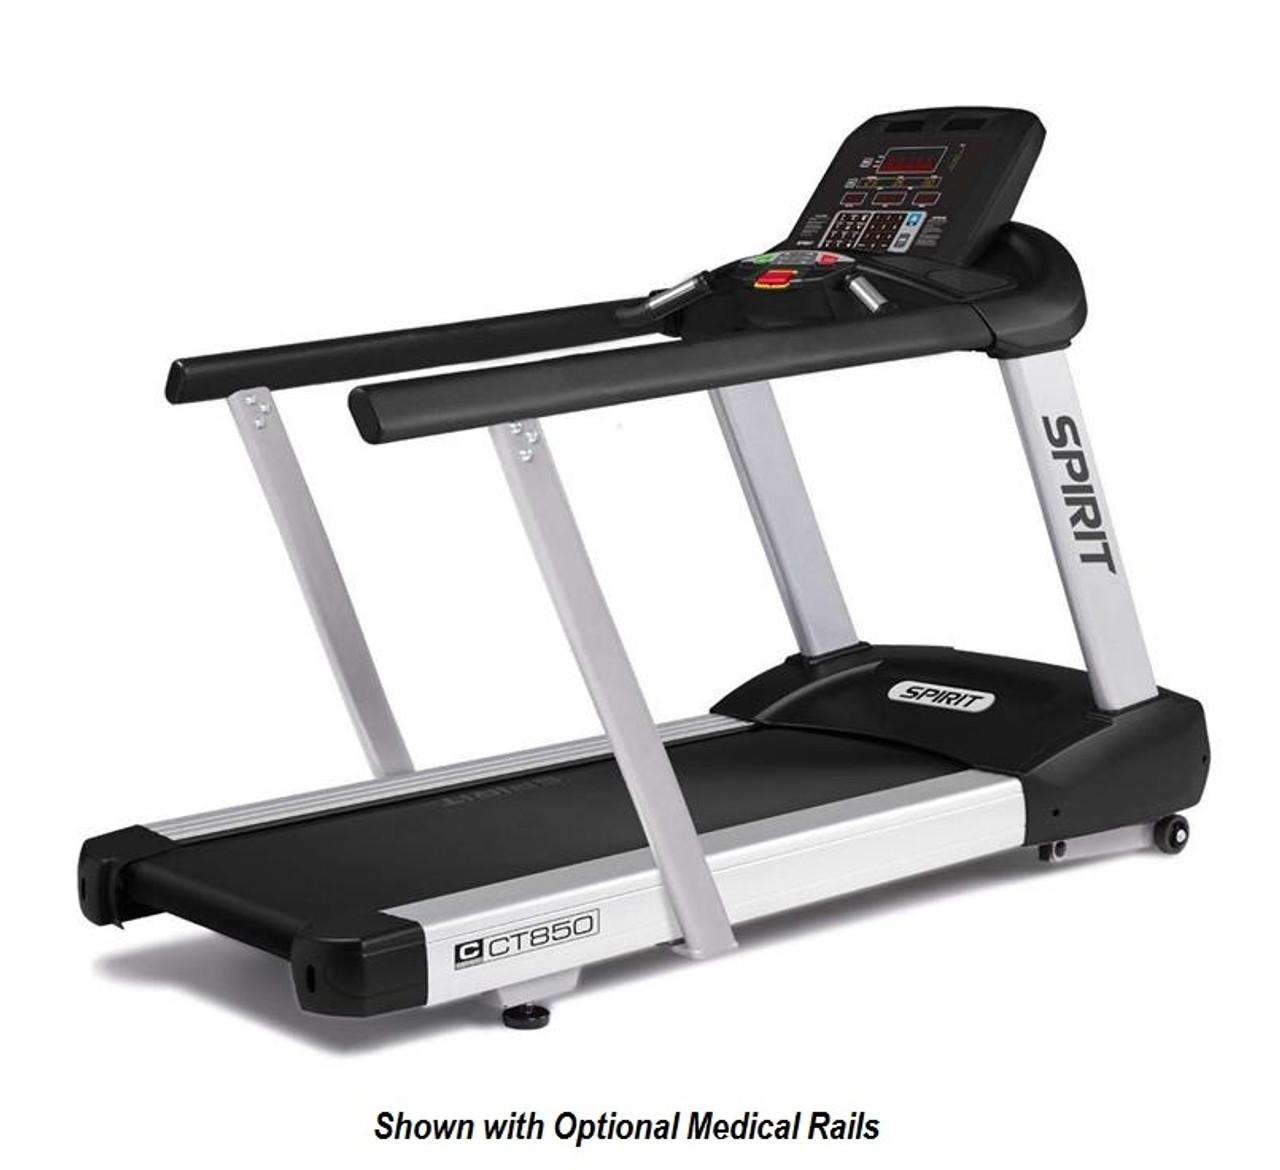 Spirit Fitness CT850 Treadmill Medical Handrails Option - Exertools